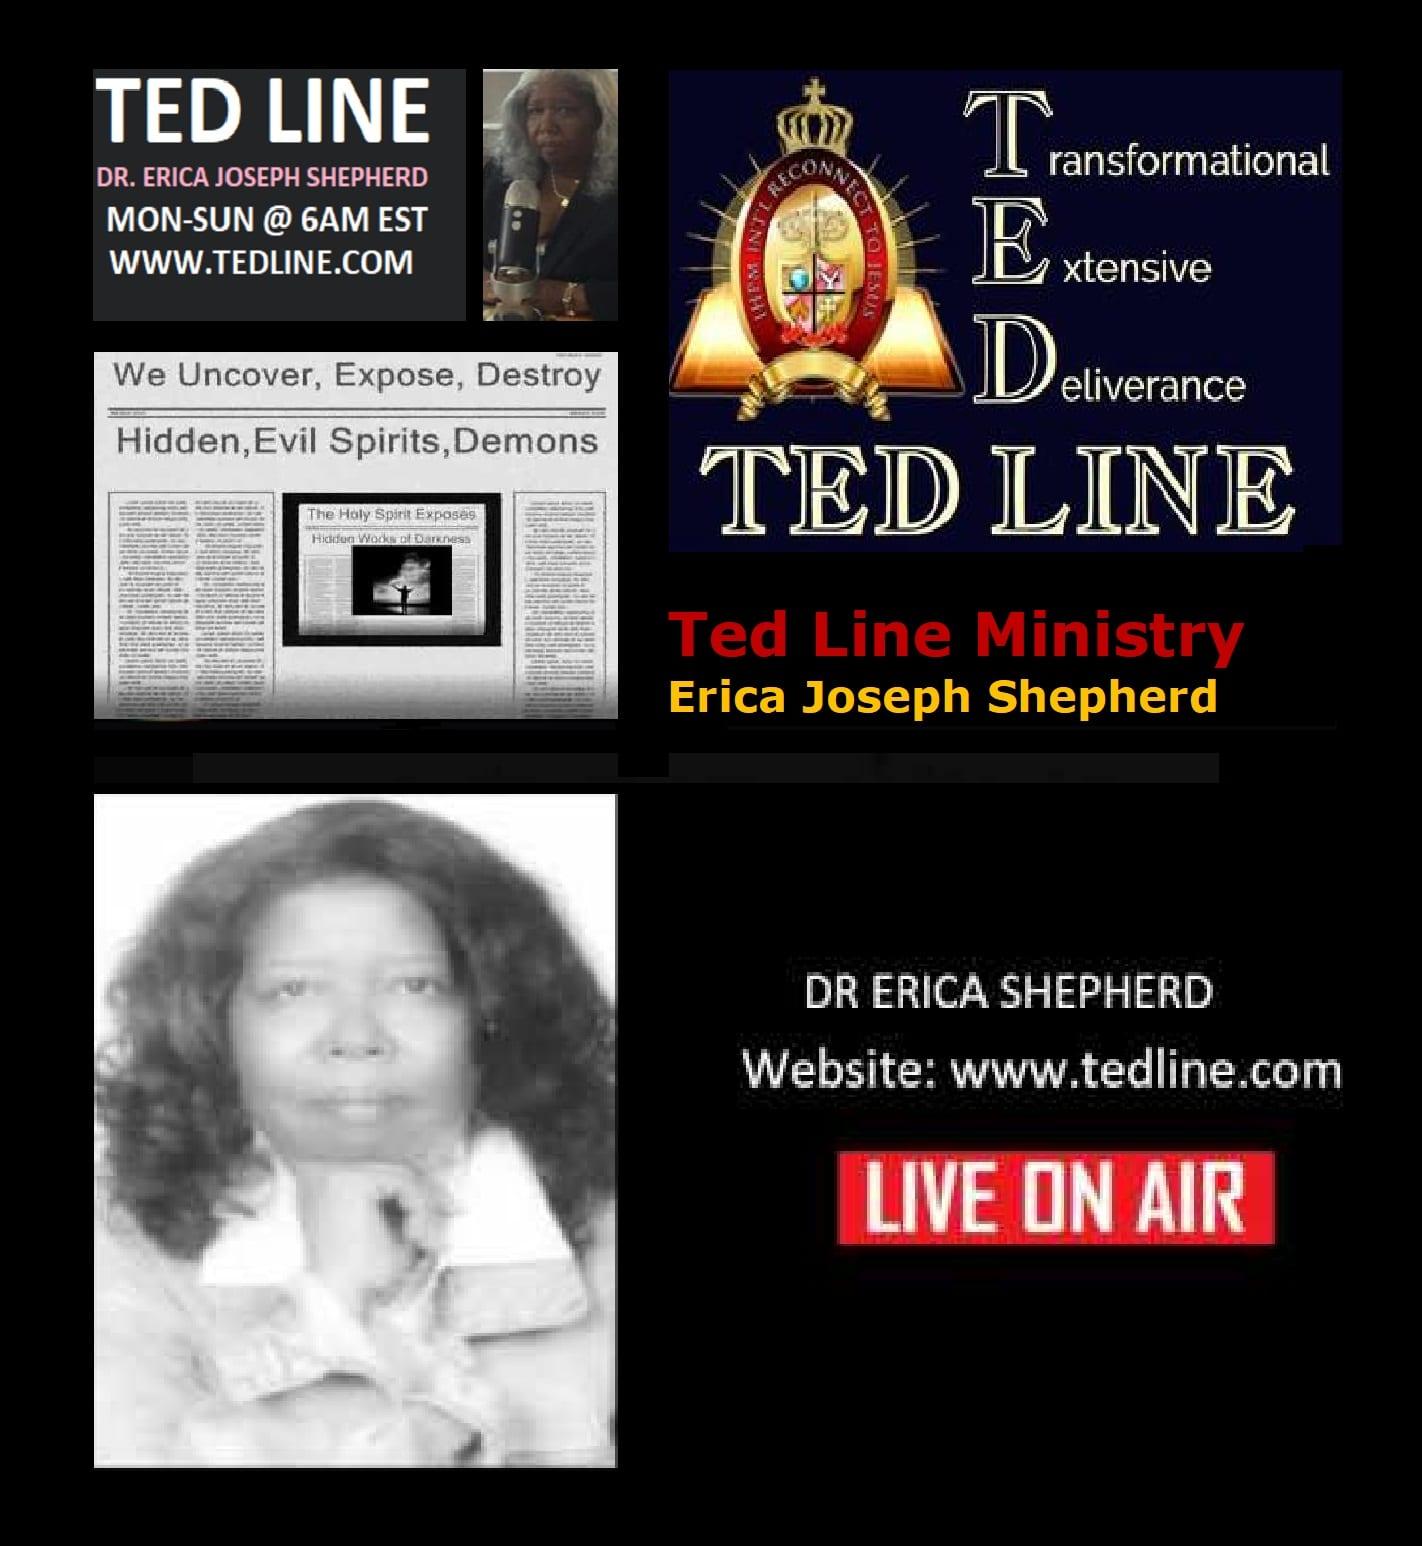 Erica Joseph Shepherd Ministries